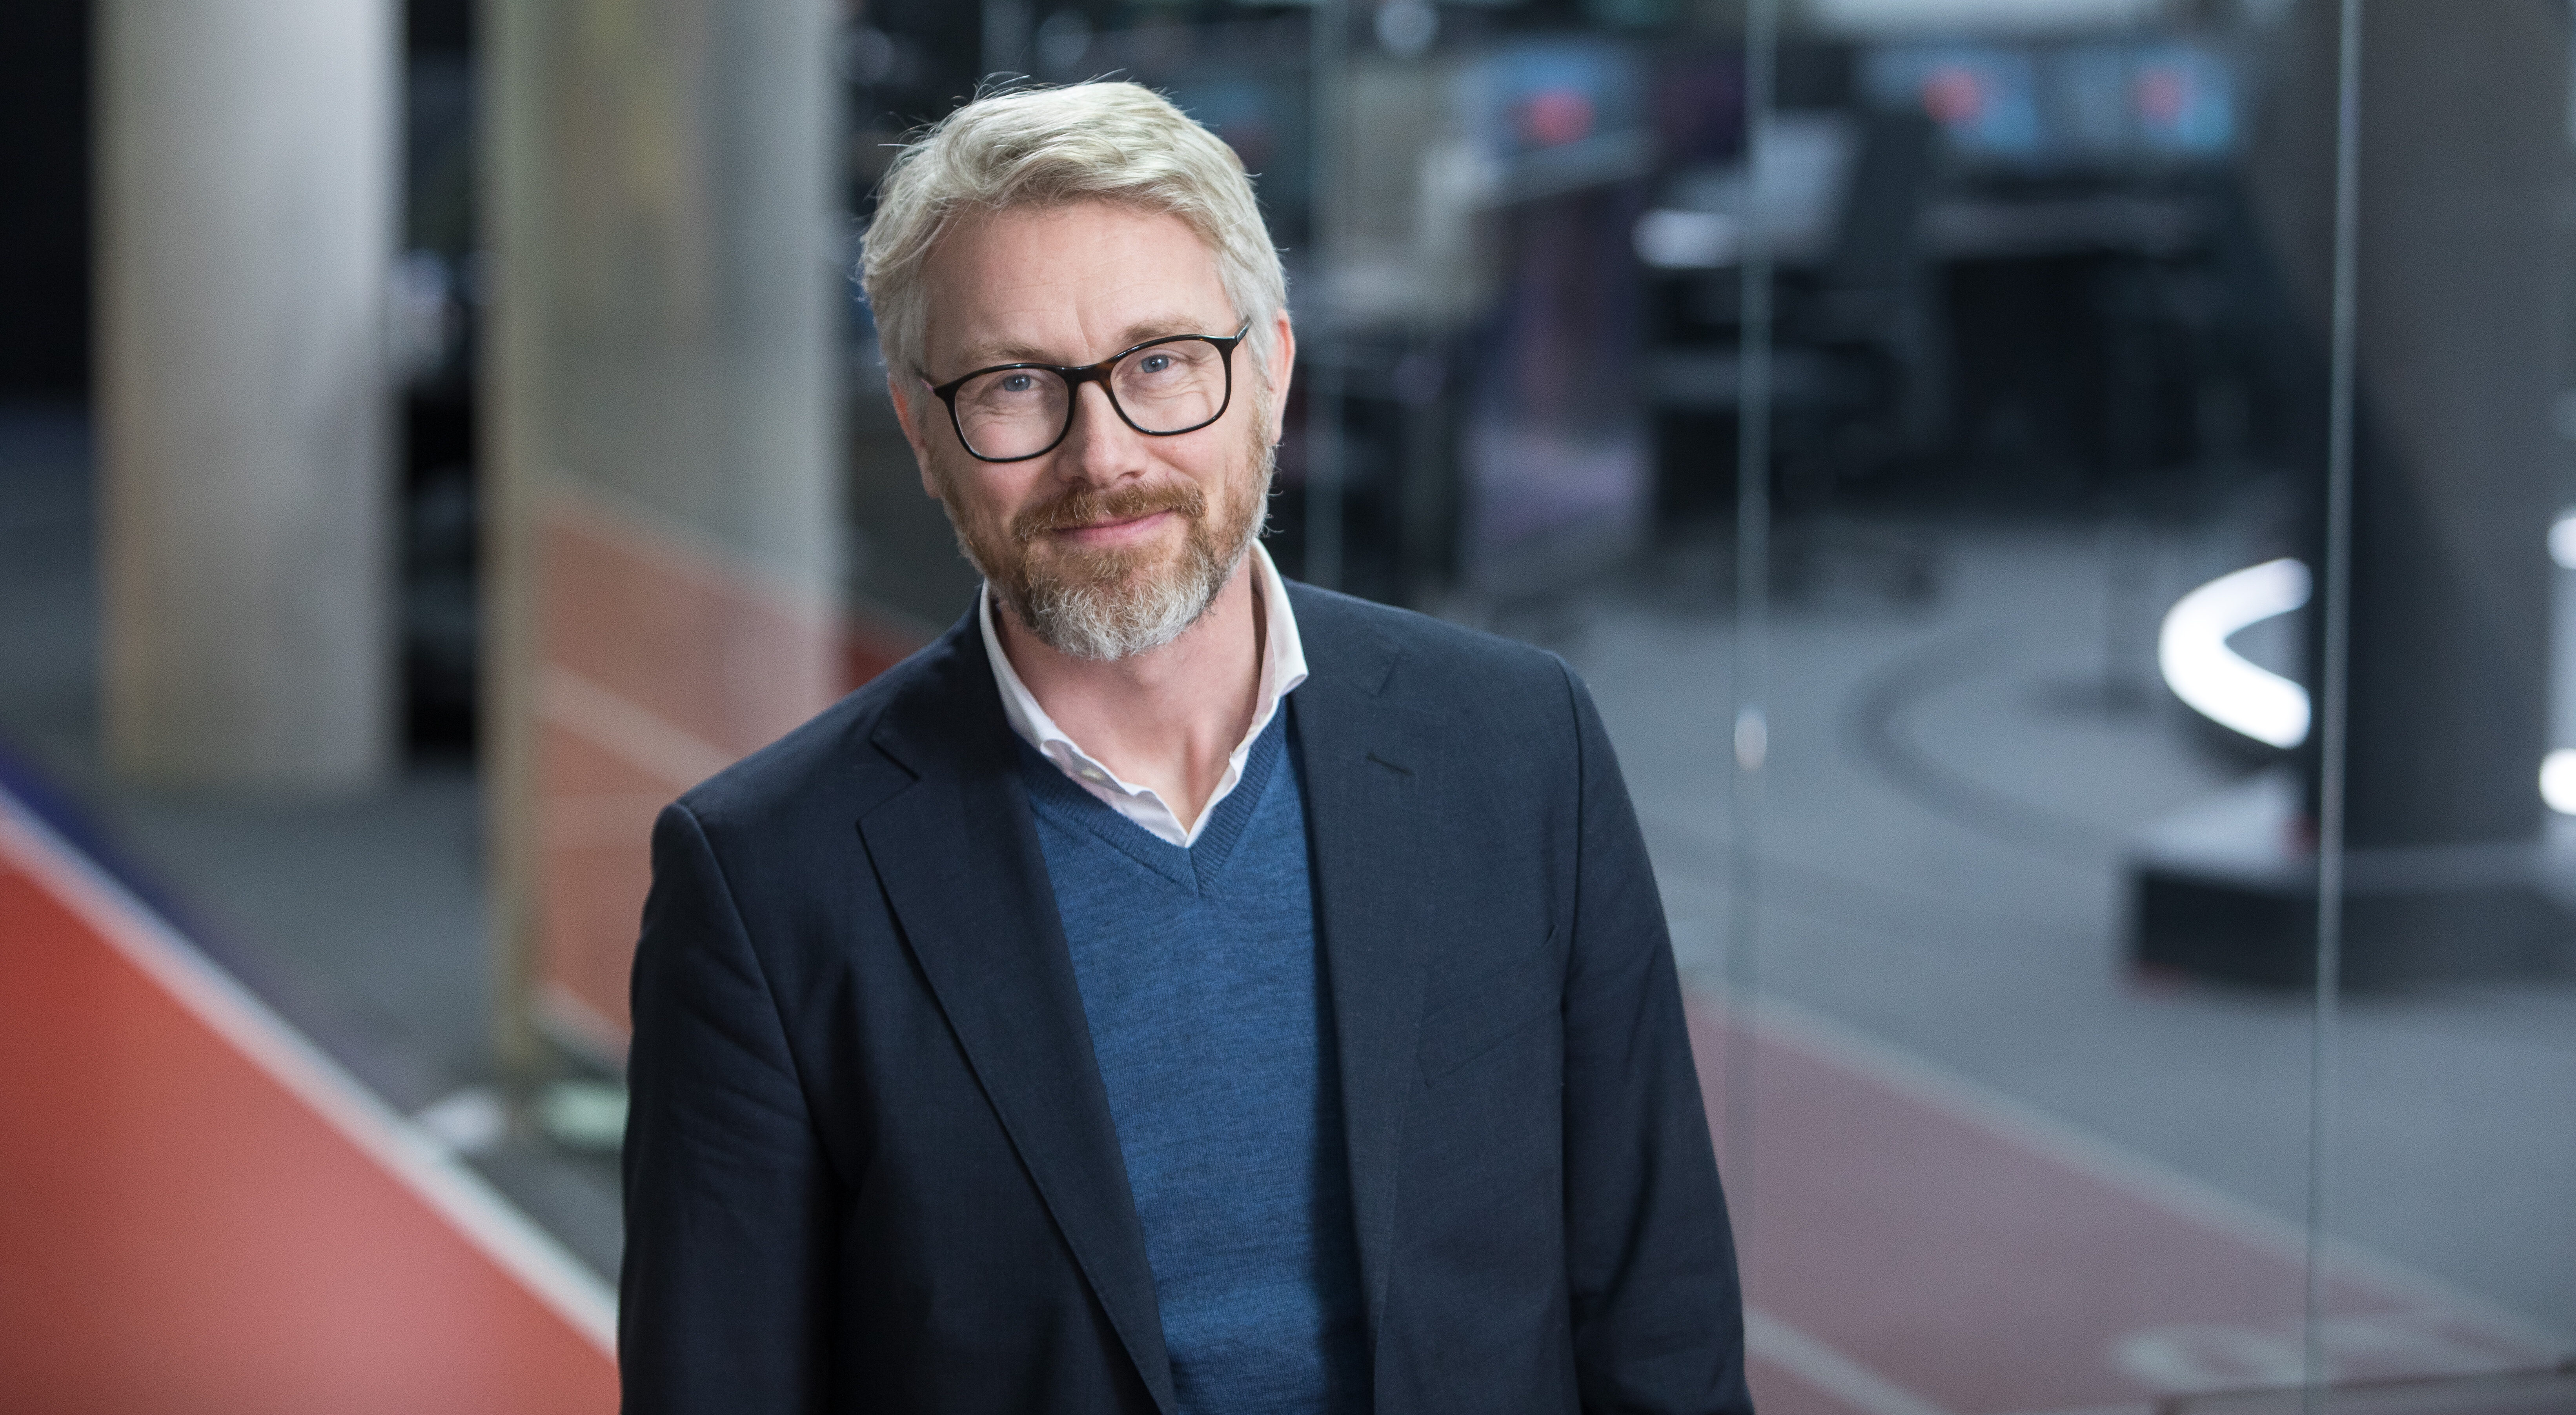 Olav T. Sandnes, TV2